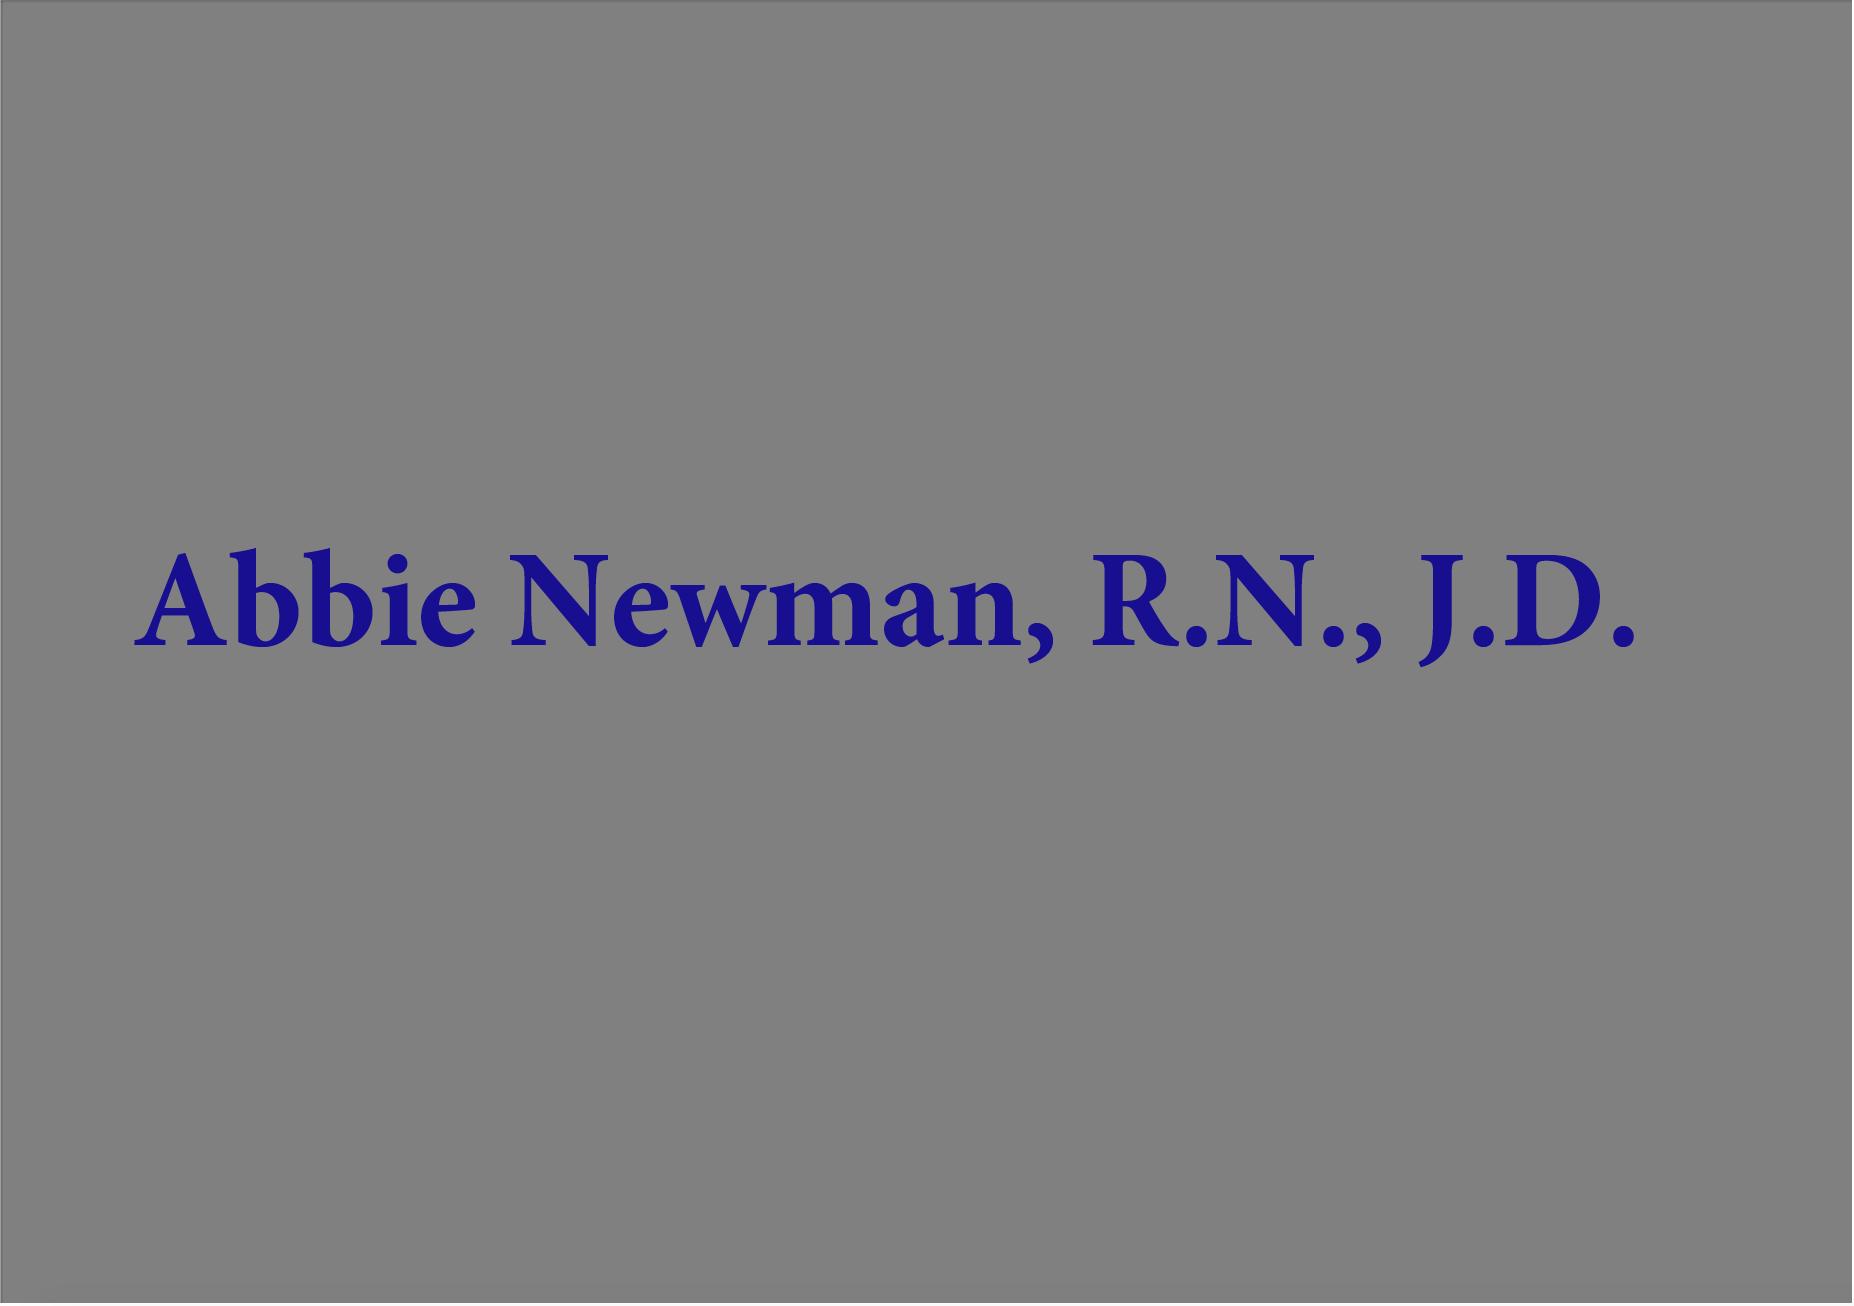 abbie newman.png